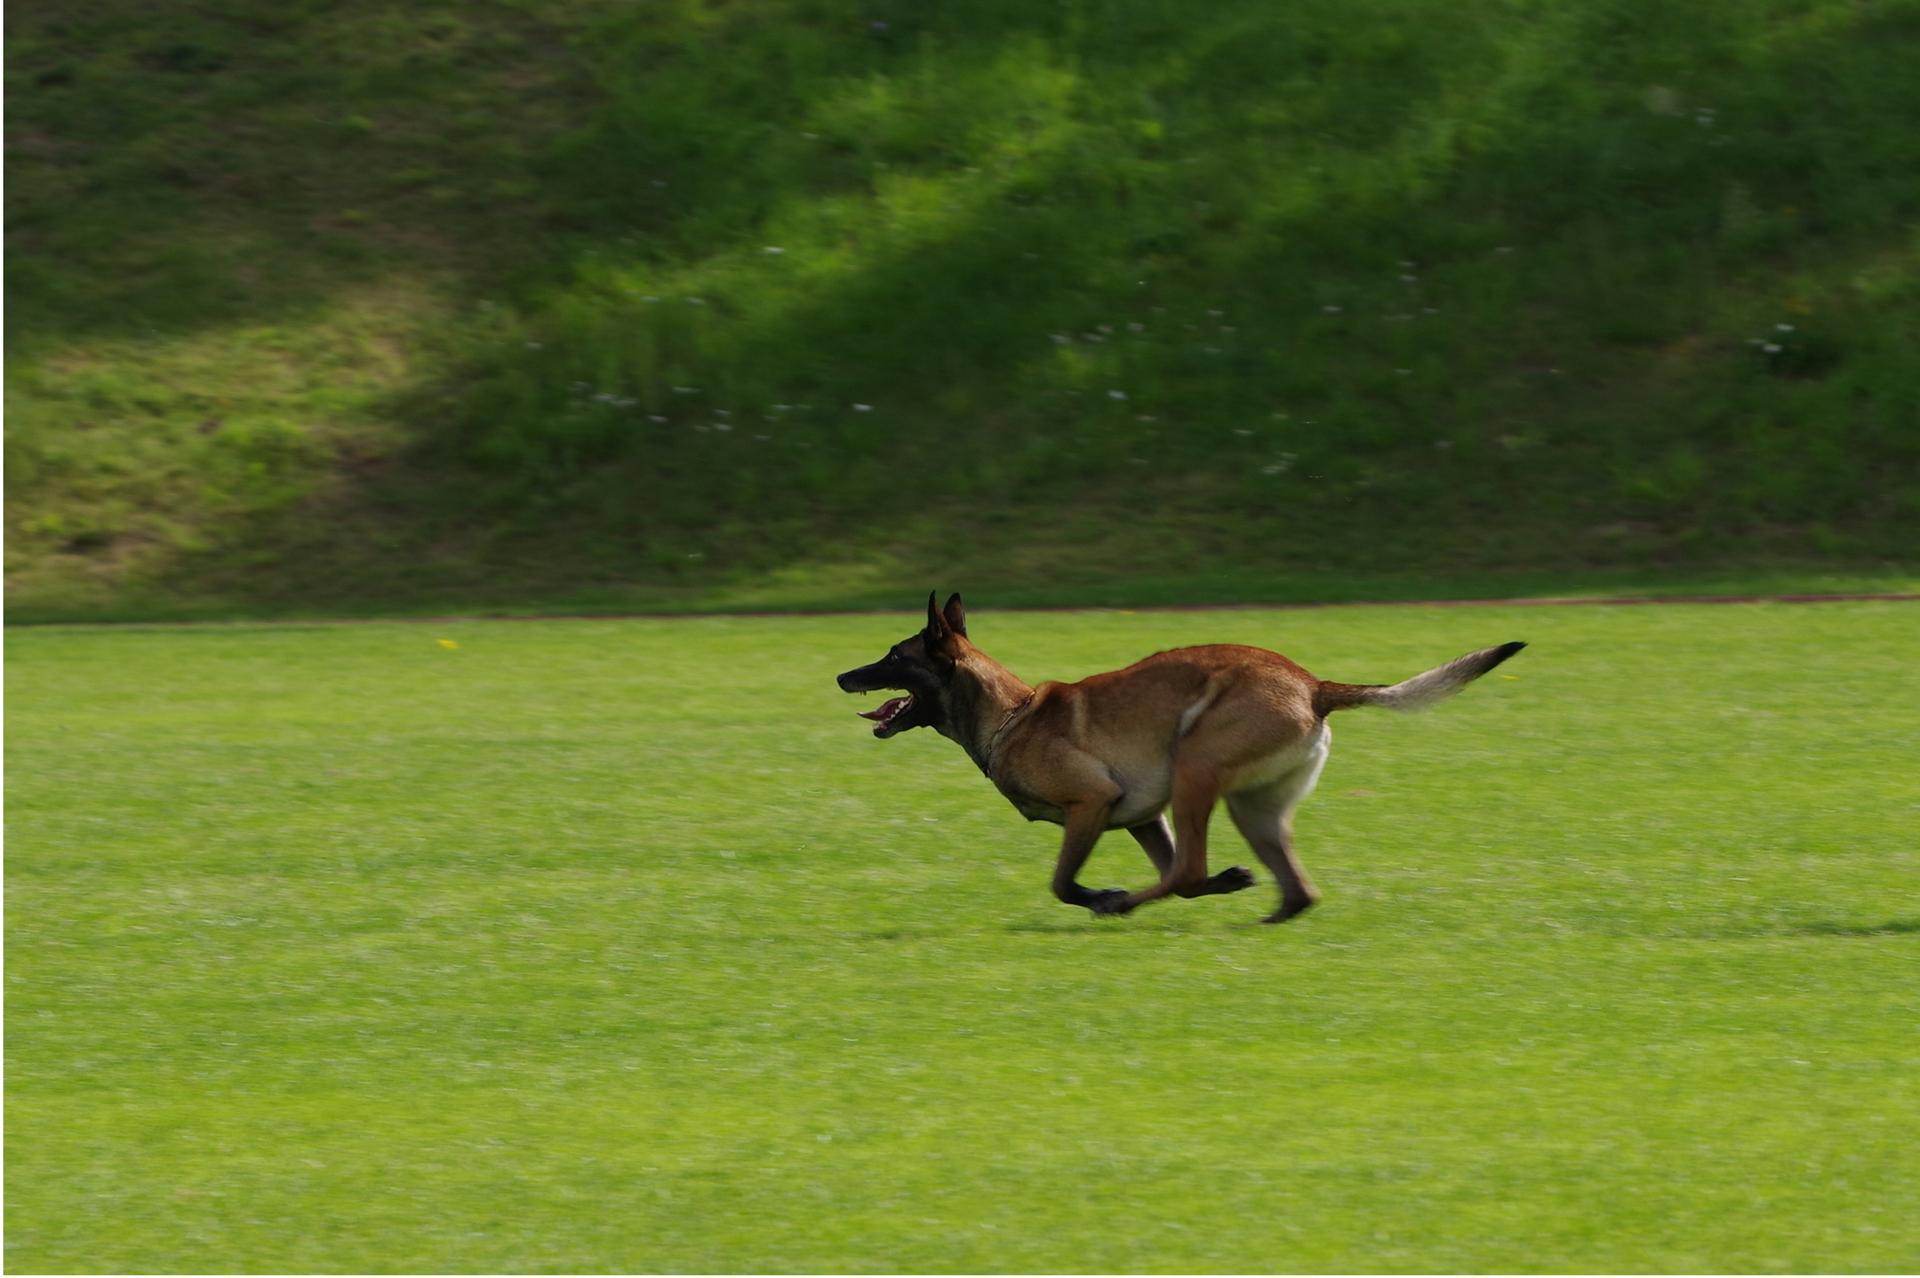 Dog running through park